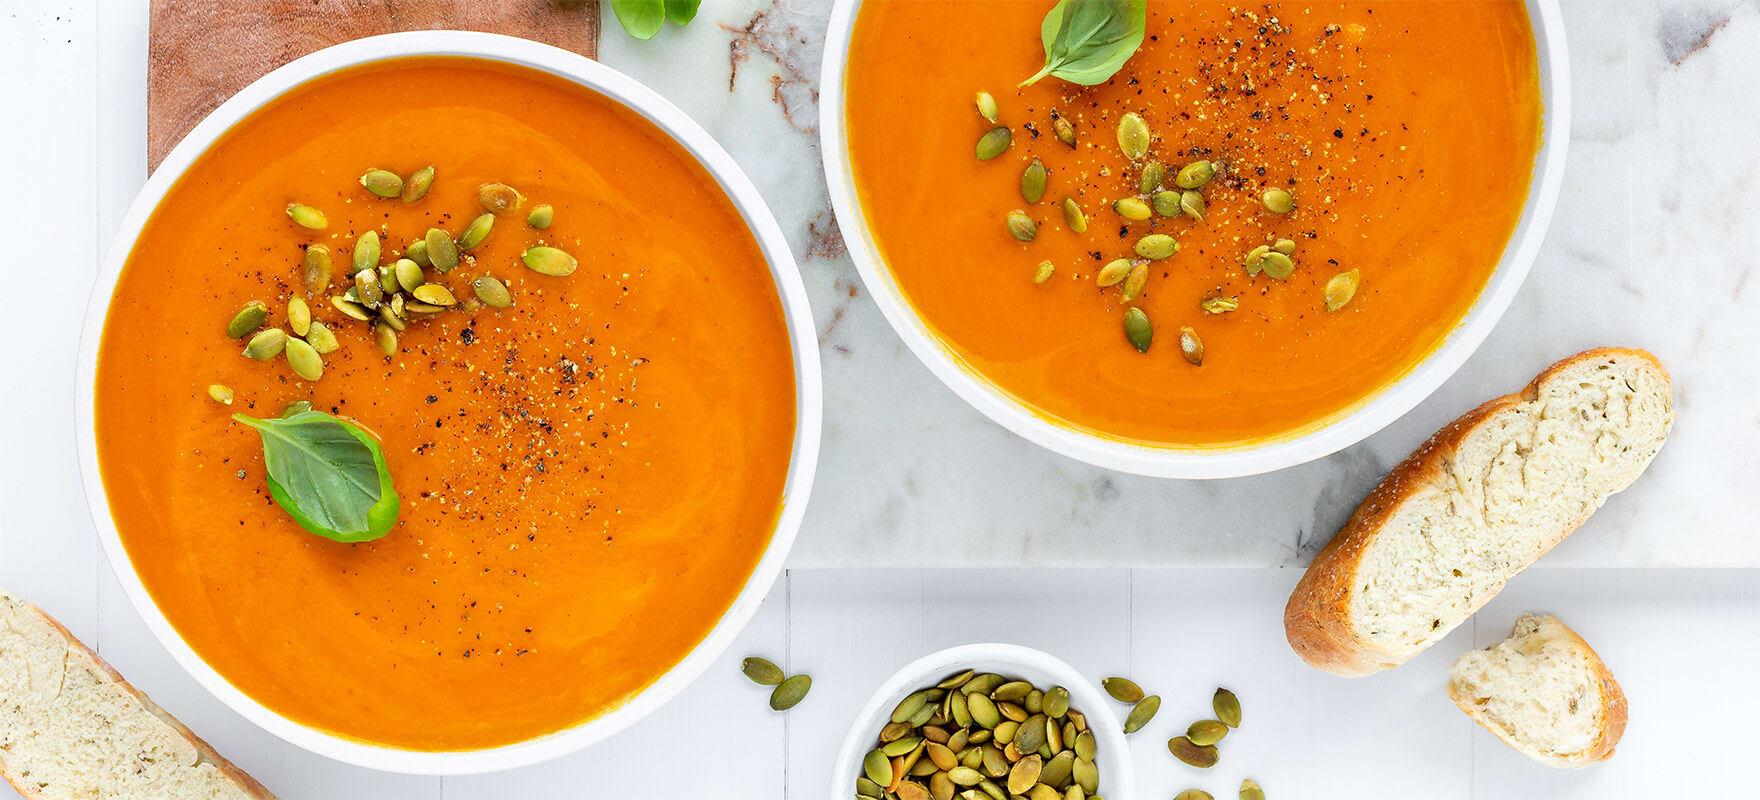 Creamy pumpkin soup image 1